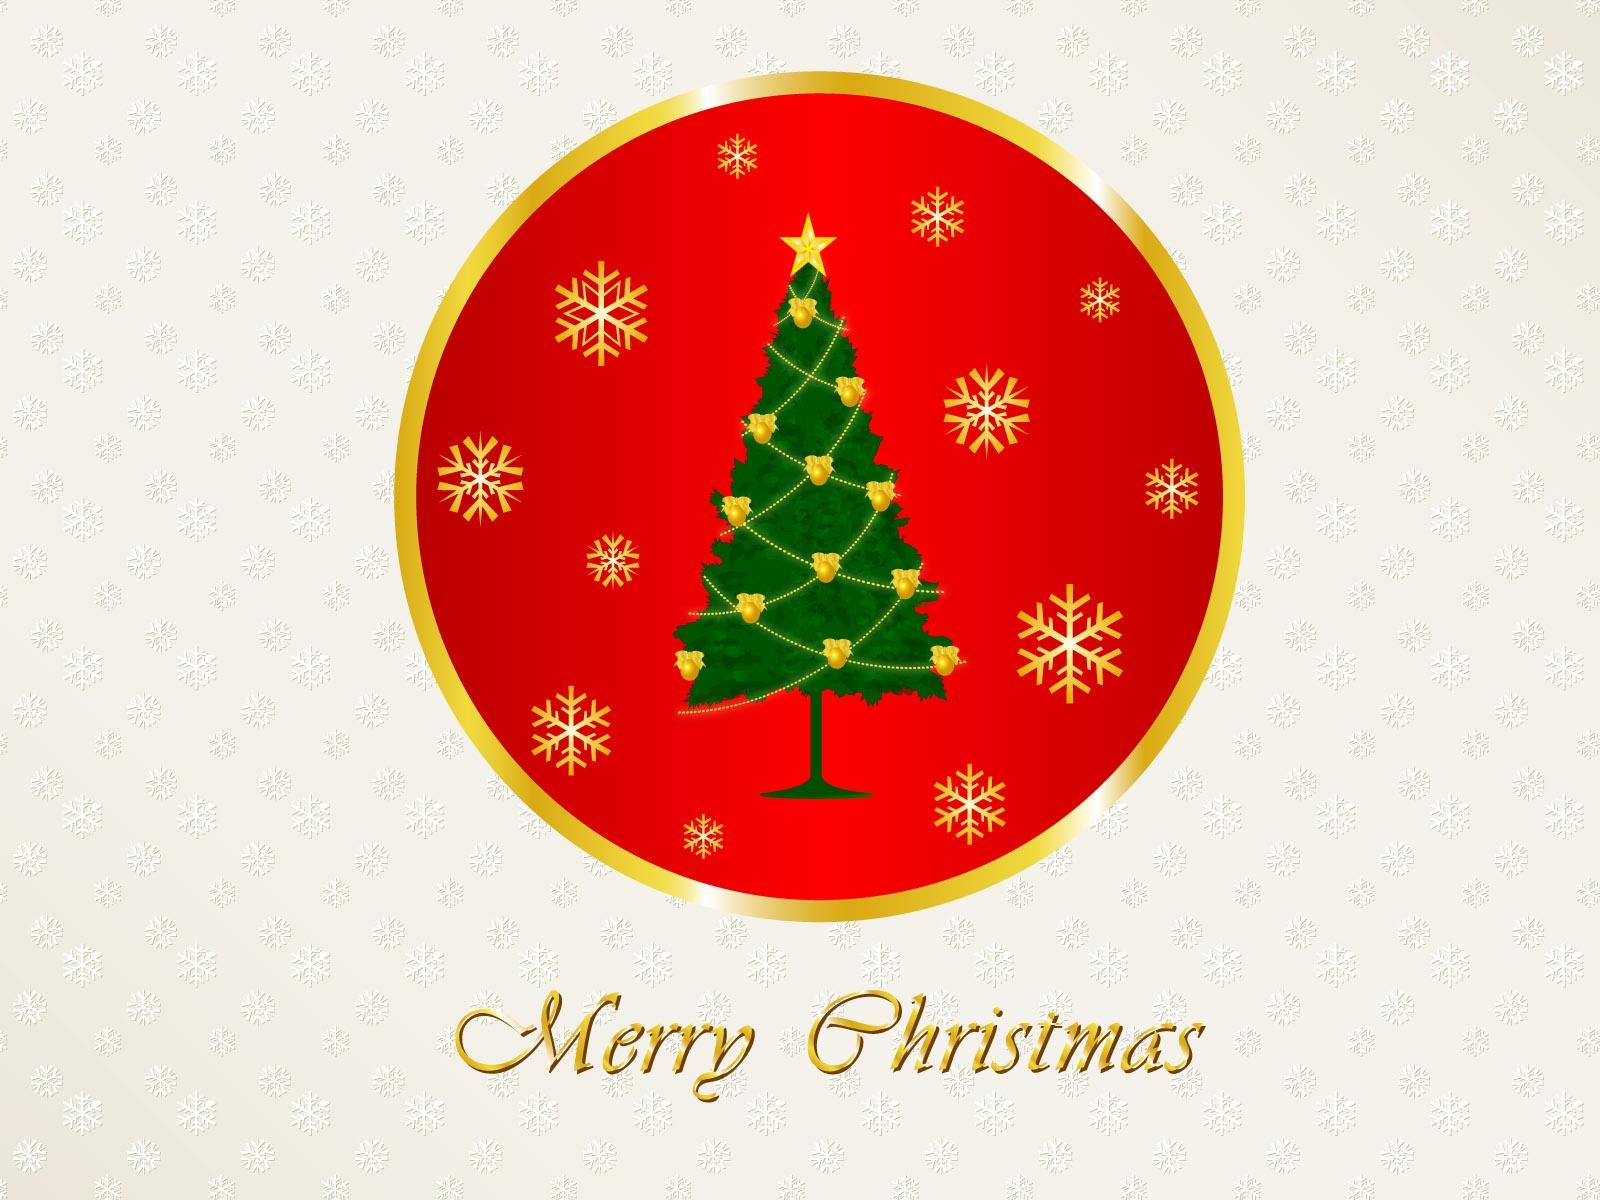 Christmas Friend Poems